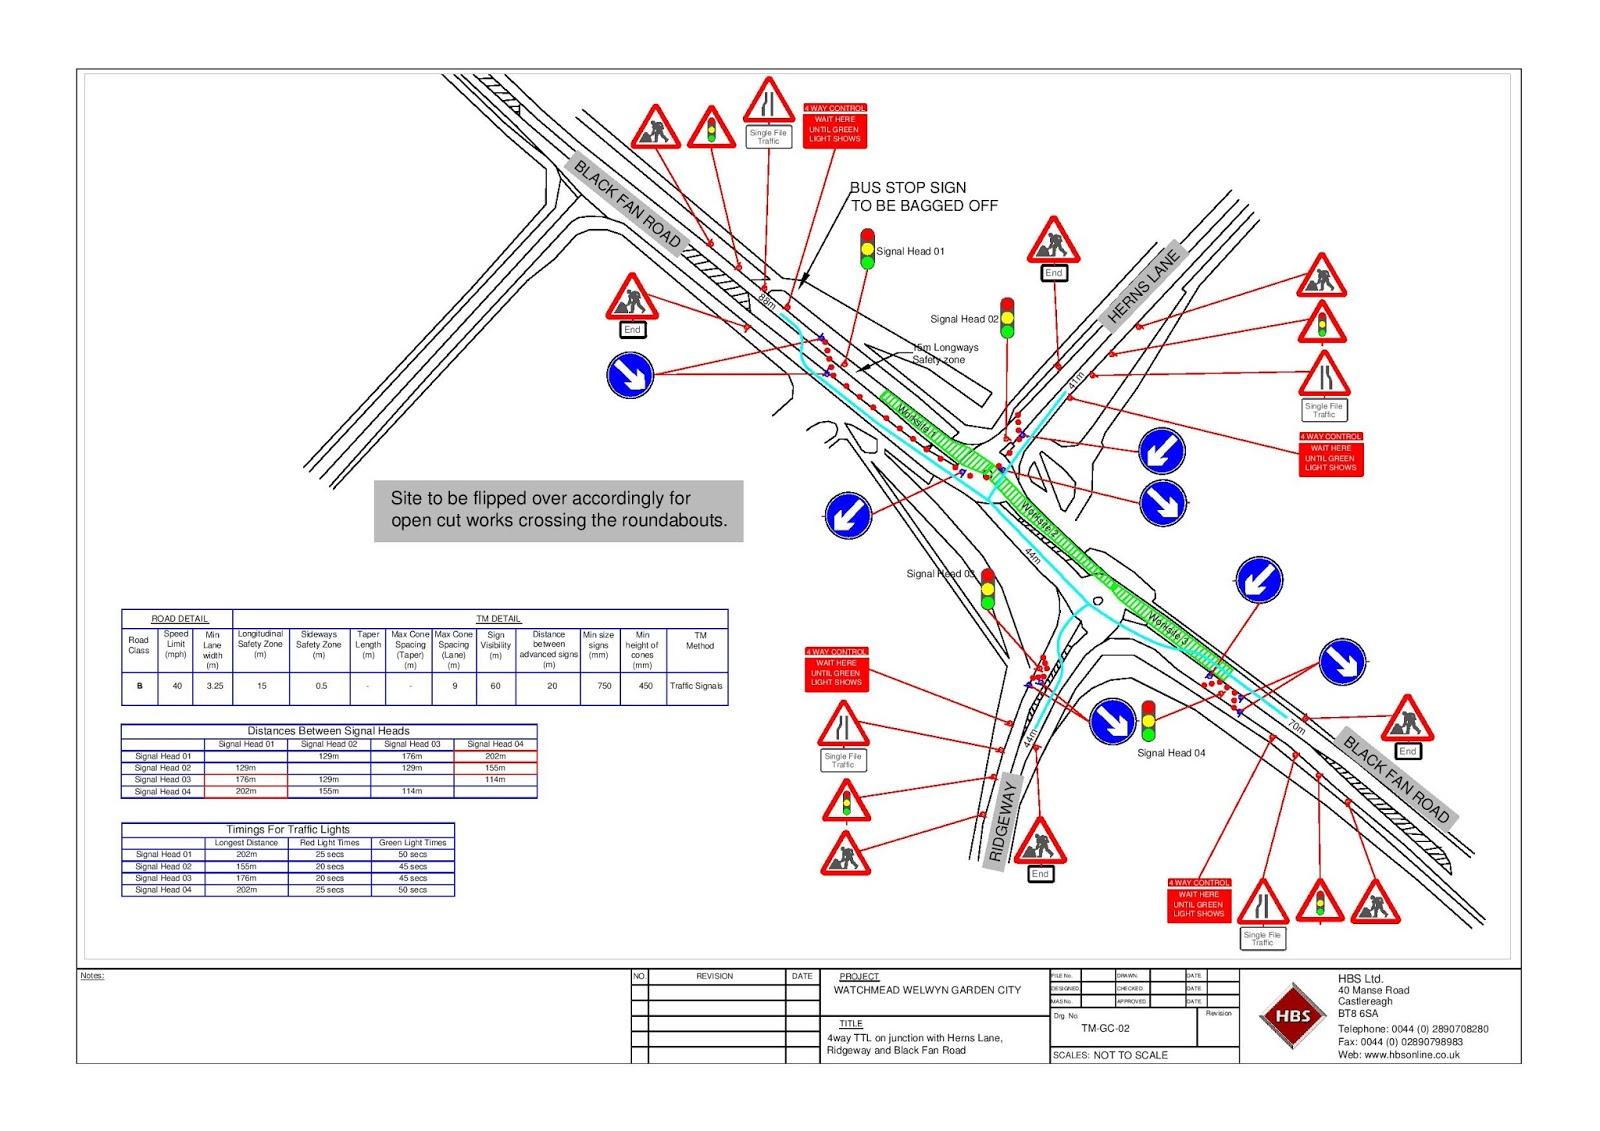 Welwyn Garden City Traffic Management Proposal